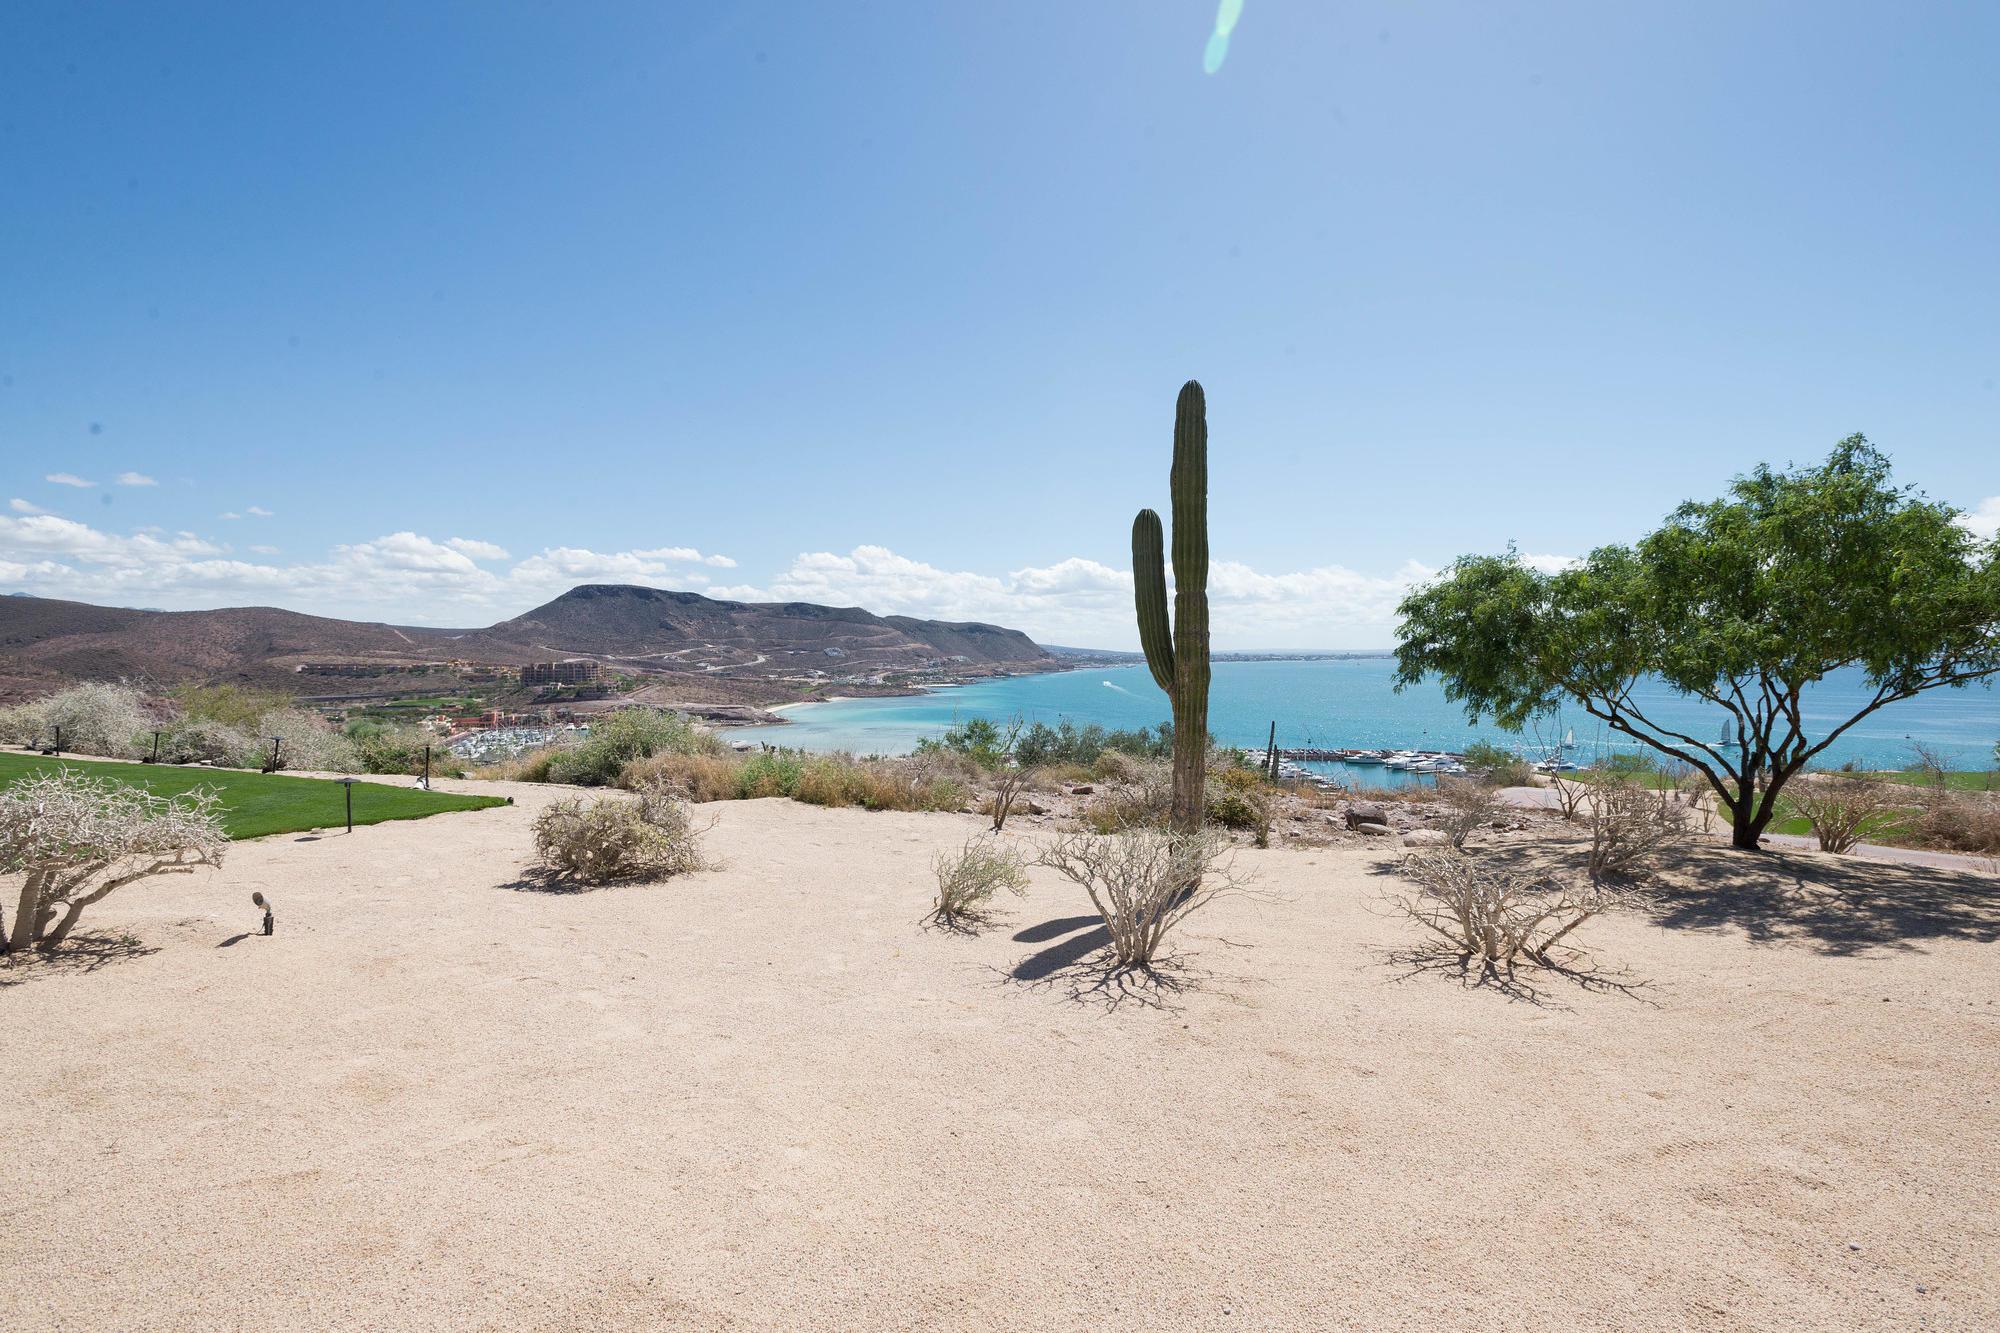 Desert coast of La Paz from CostaBaja Resort & Spa